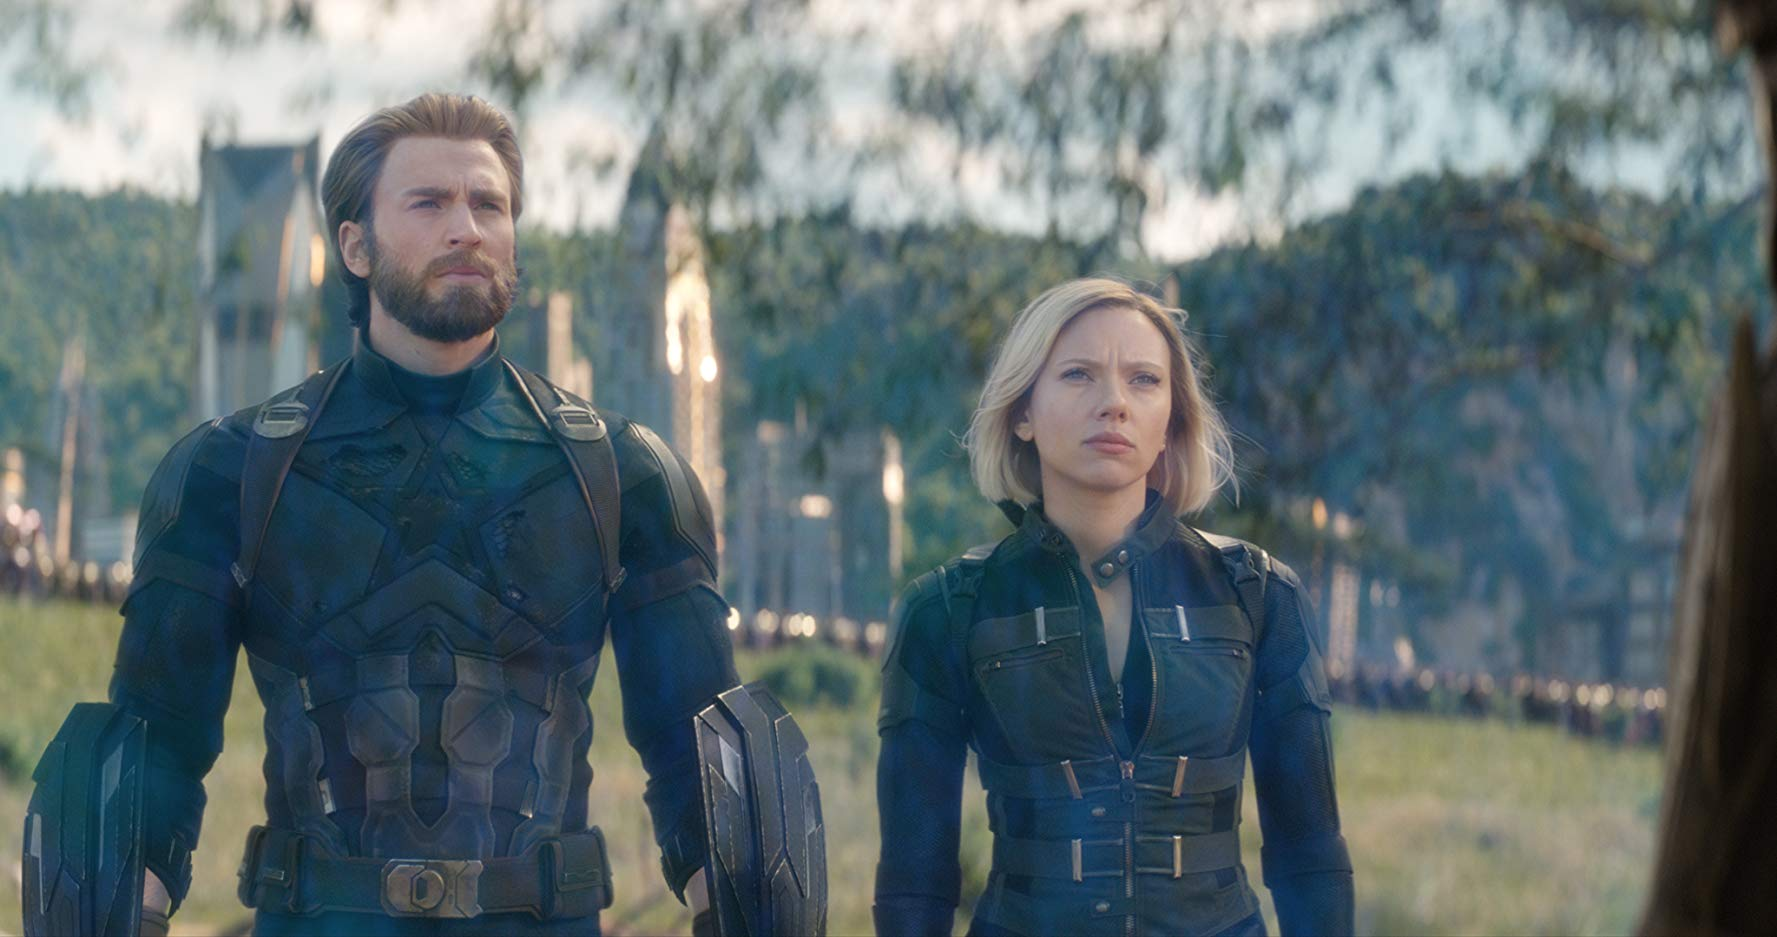 steve rogers and natasha romanoff in avengers: infinity war